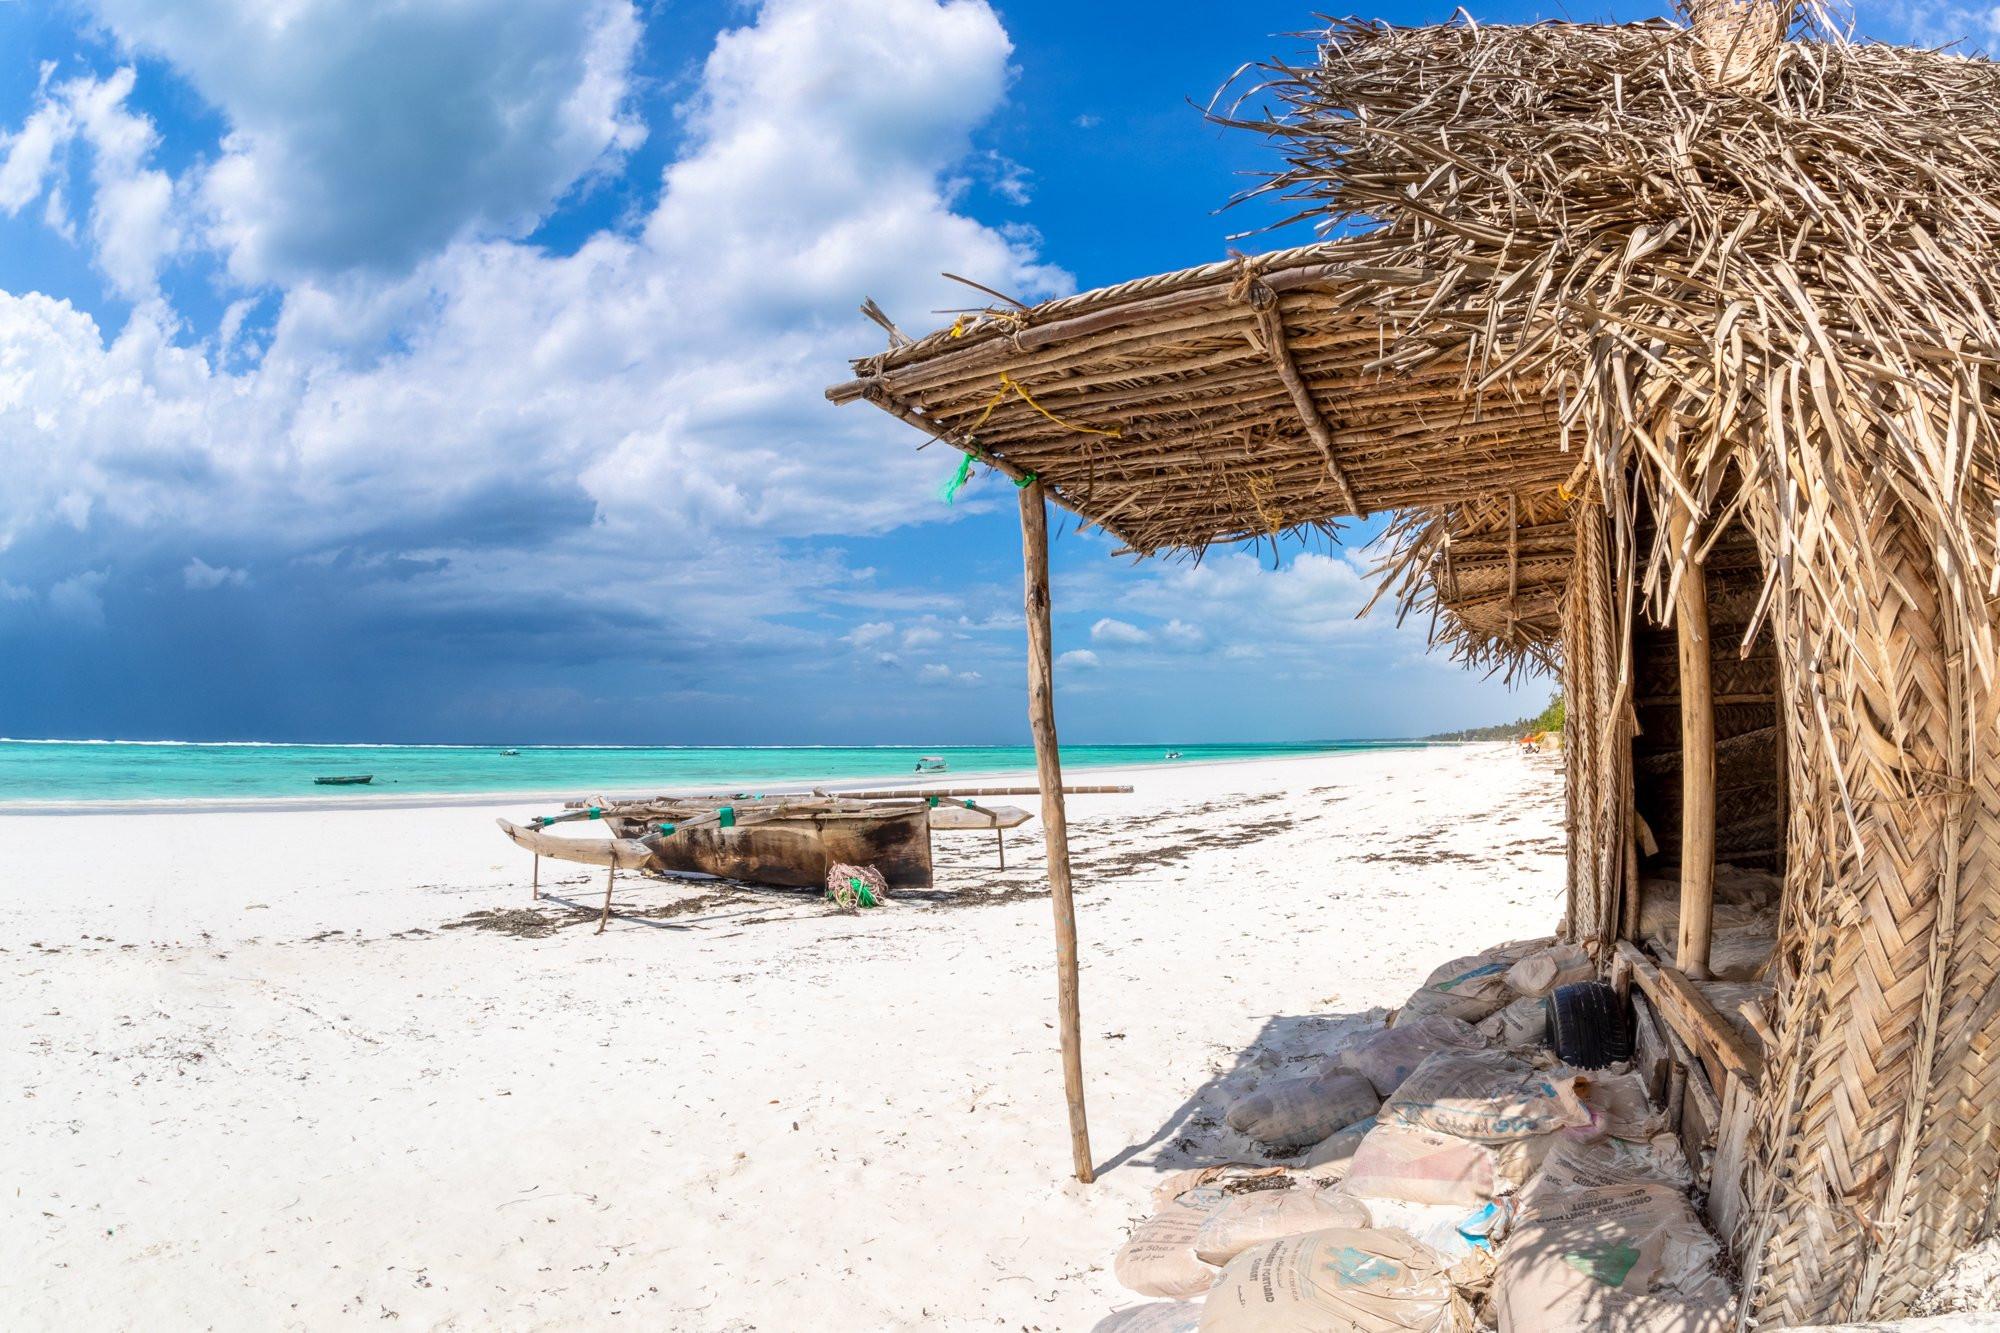 Matemwe beach hut and boat, Zanzibar Tanzania